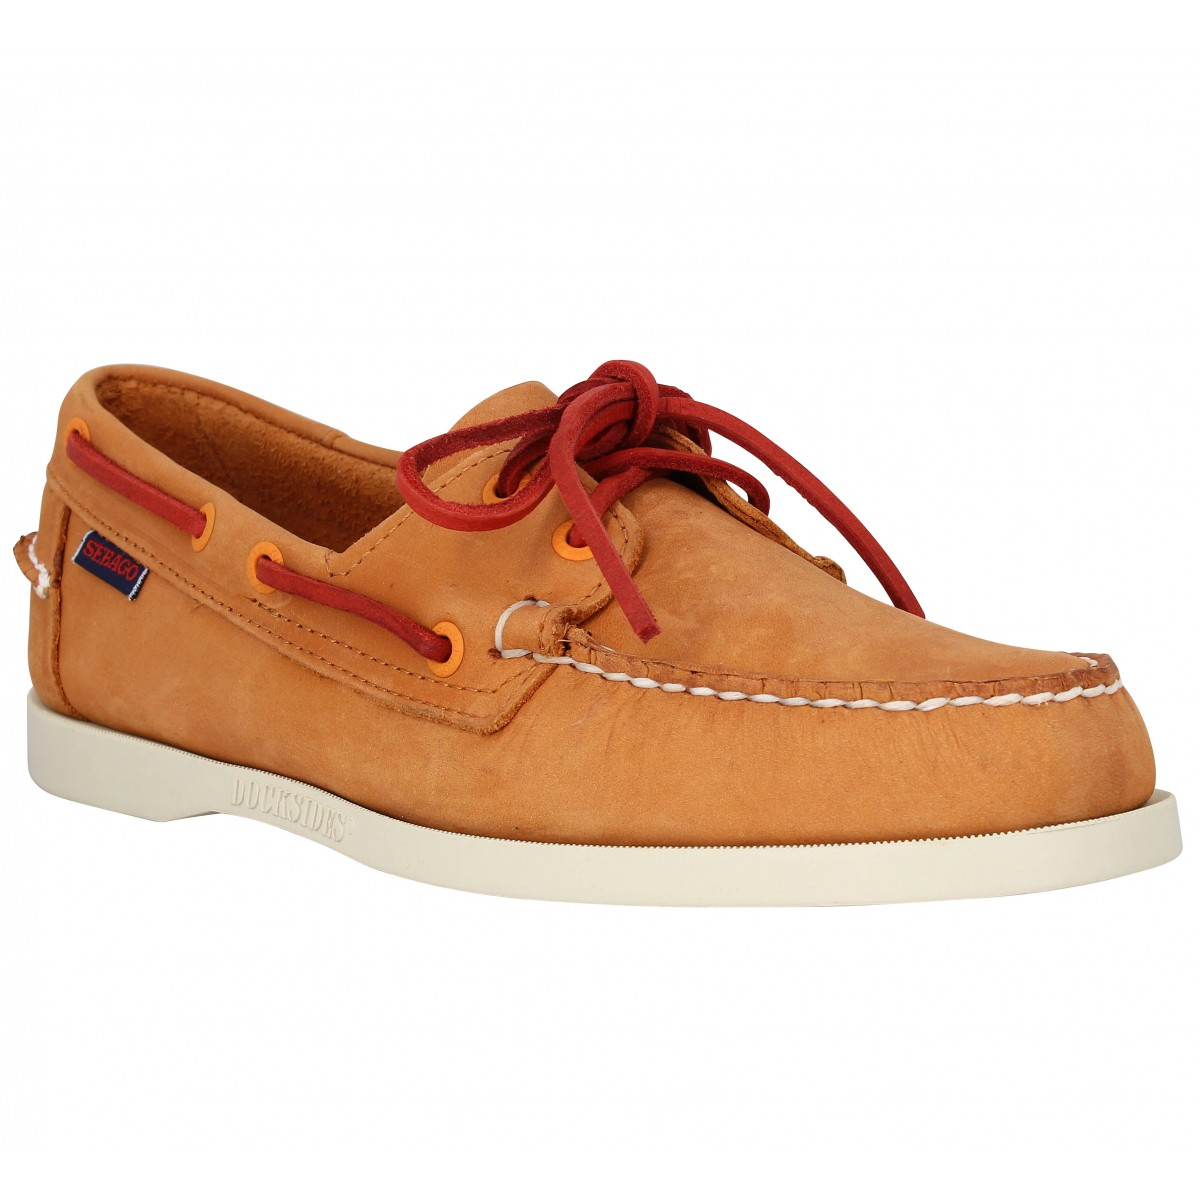 Chaussures bateaux SEBAGO Docksides velours Homme Orange